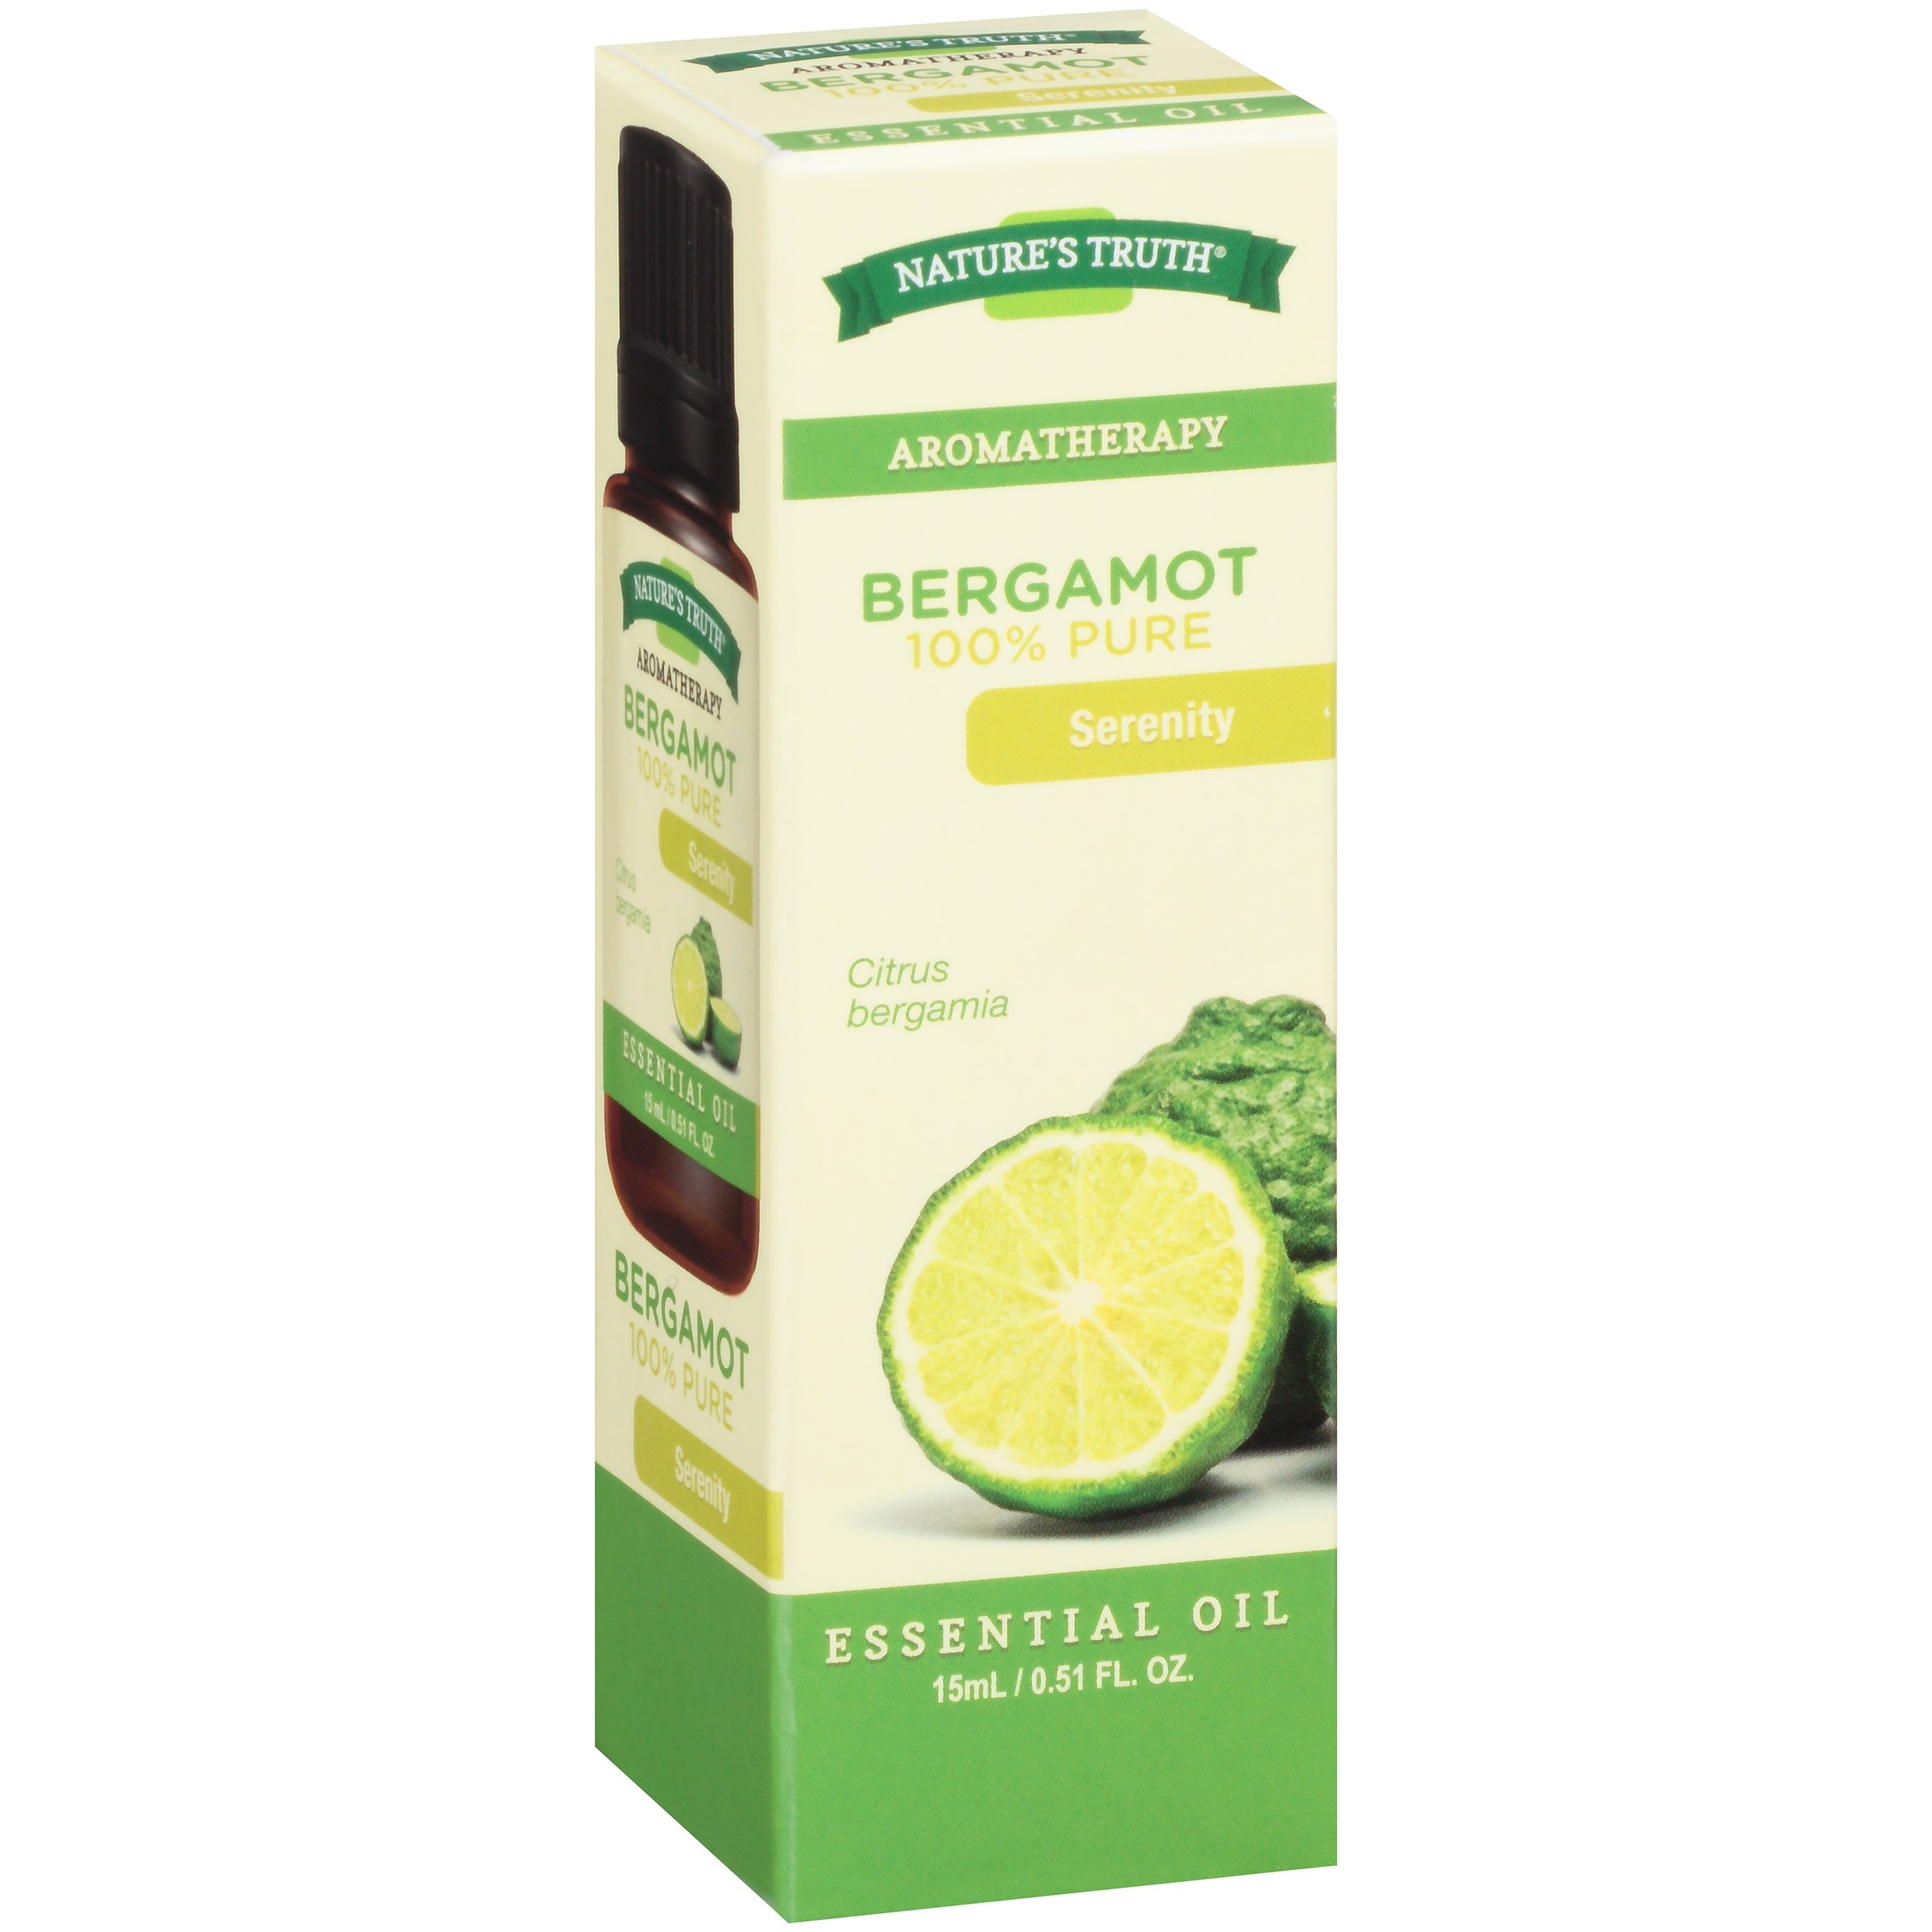 Nature's Truth Aromatherapy Bergamot Essential Oil, 0.51 Fl Oz